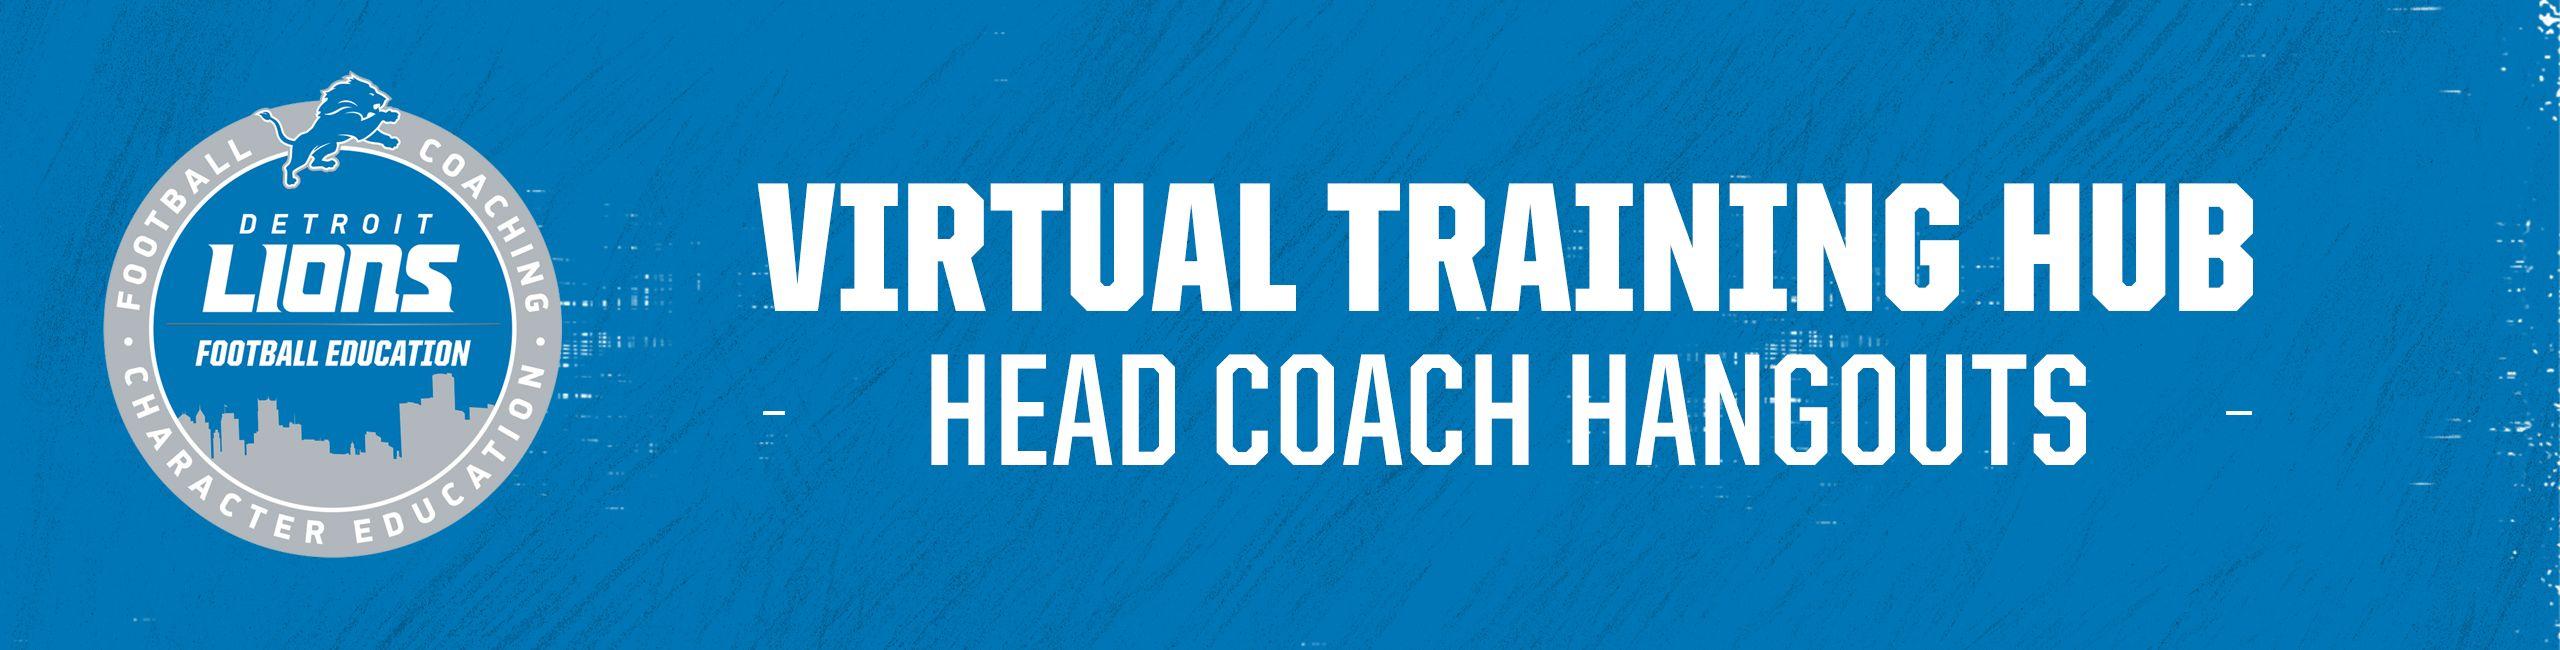 football-education-virtual-headcoach-hangout-header